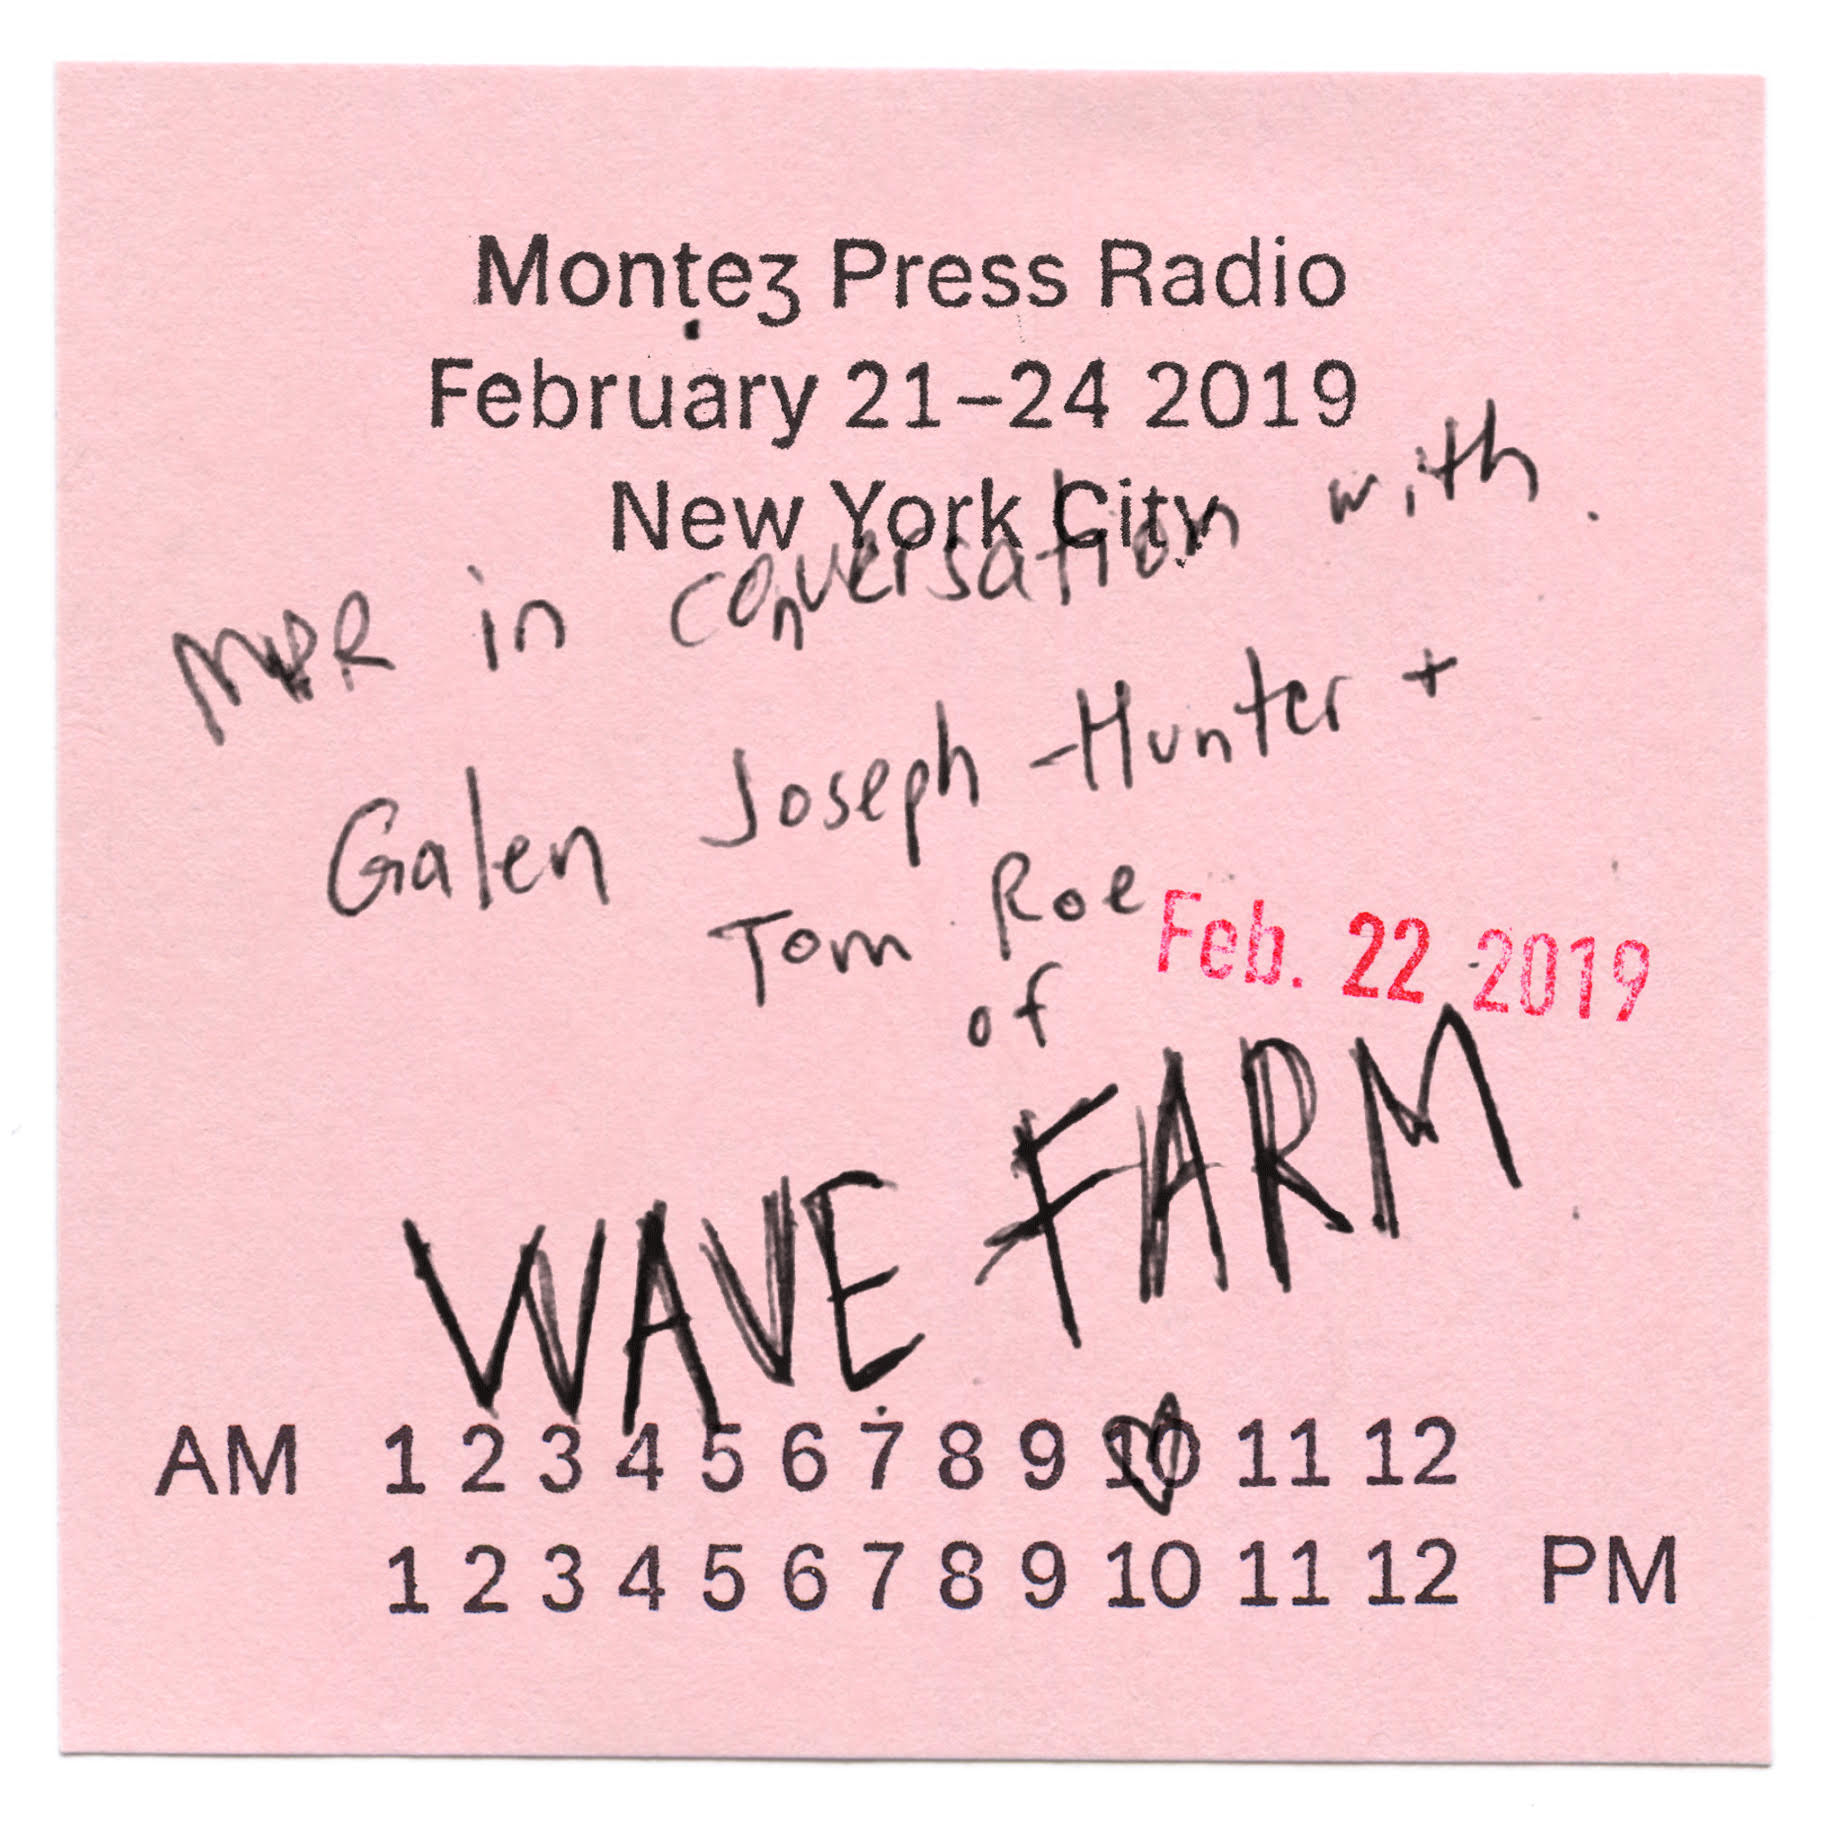 Montez Press Radio and WGXC Morning Show Exchange Interview Image